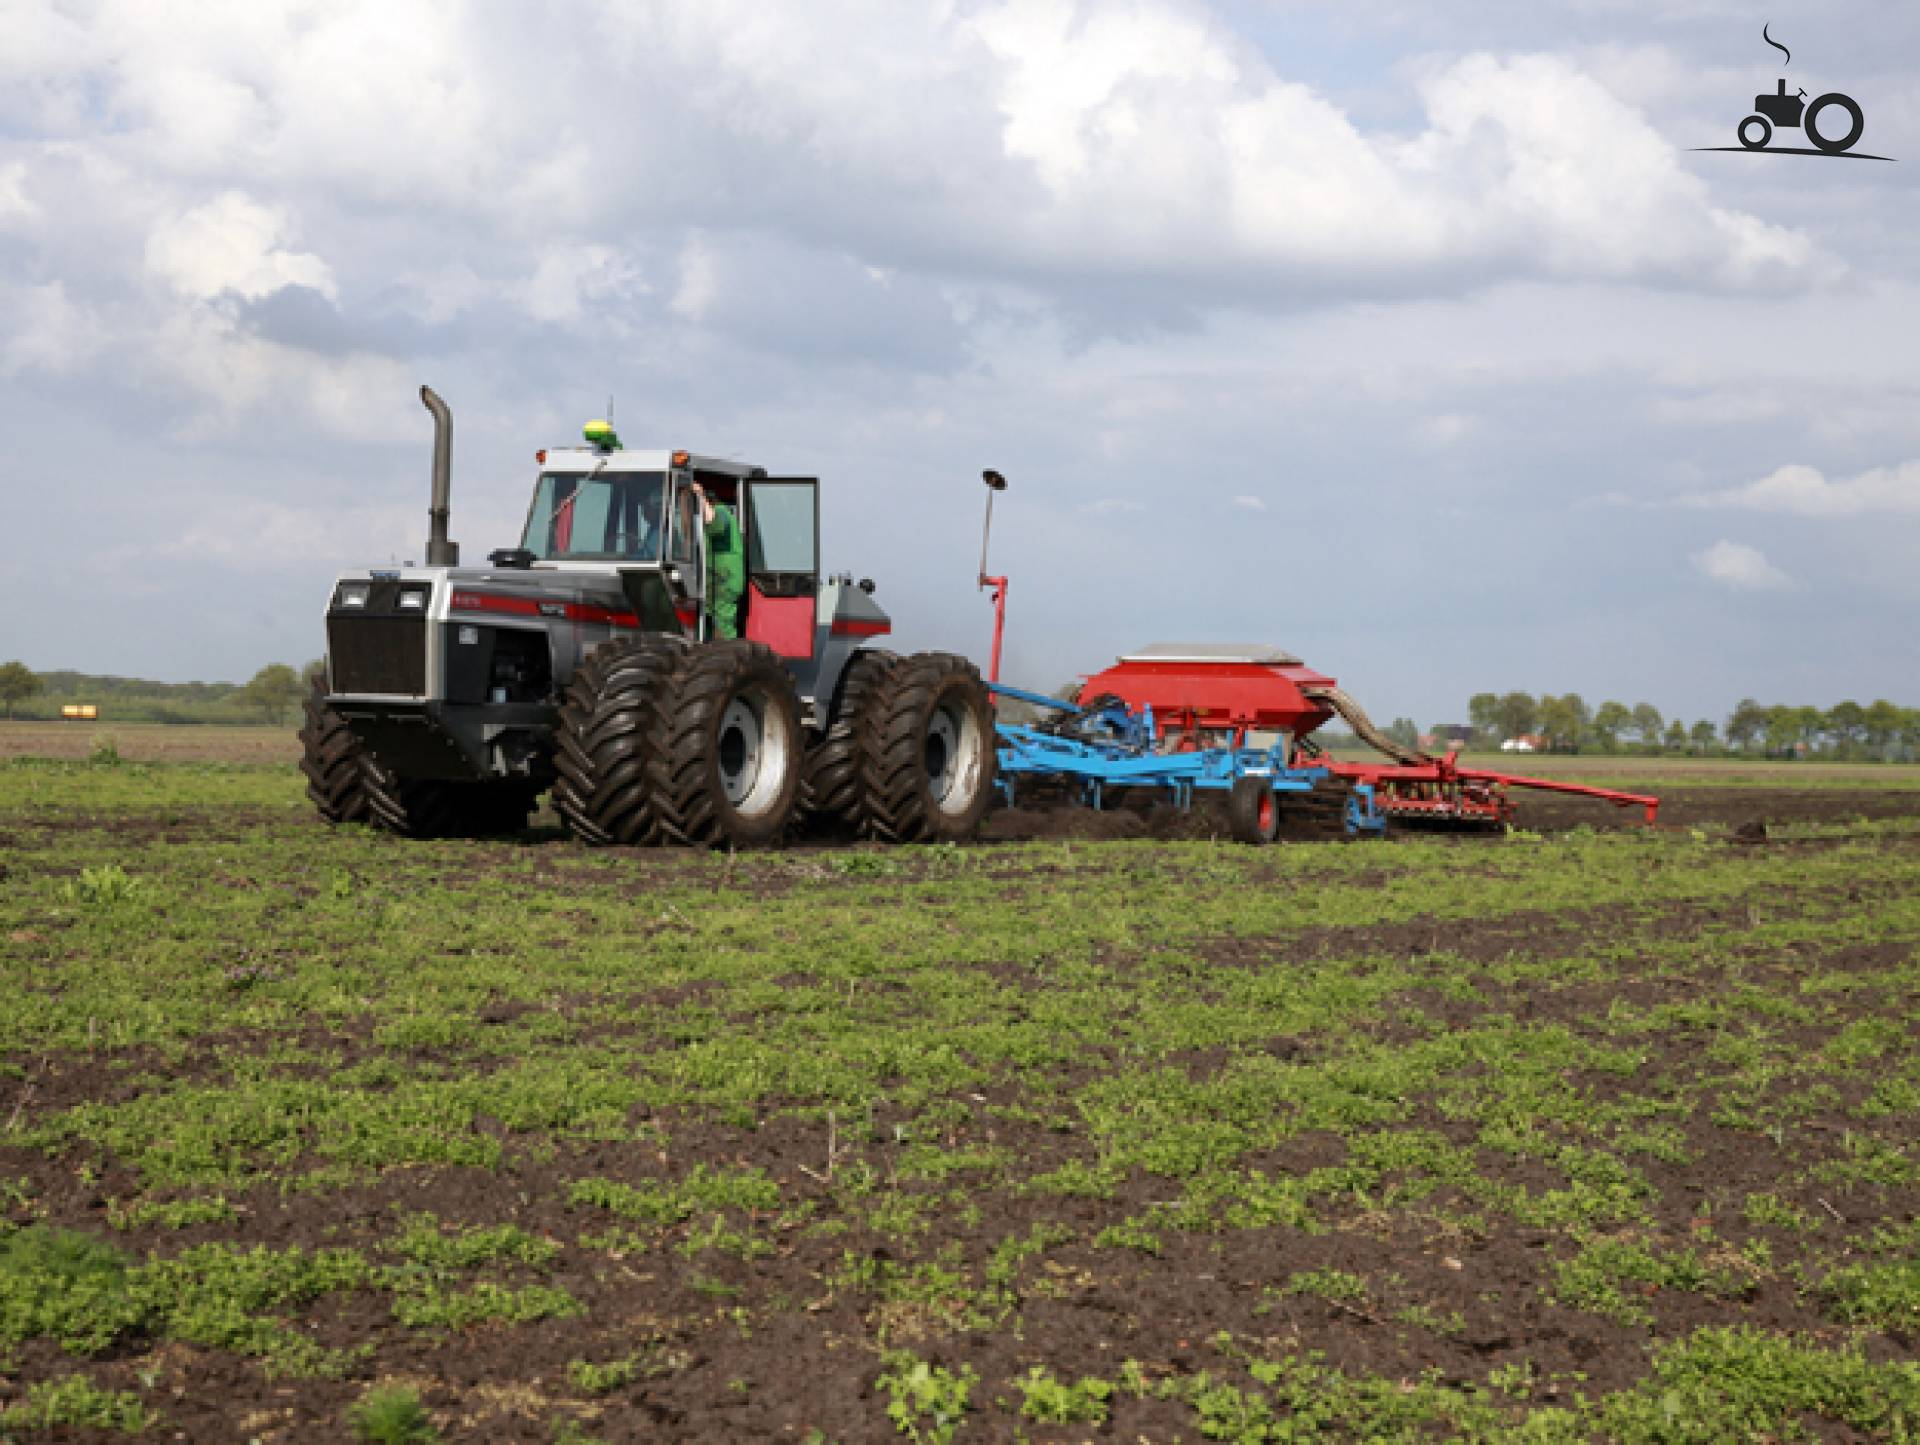 White 4 270 Tractor : Foto white field boss